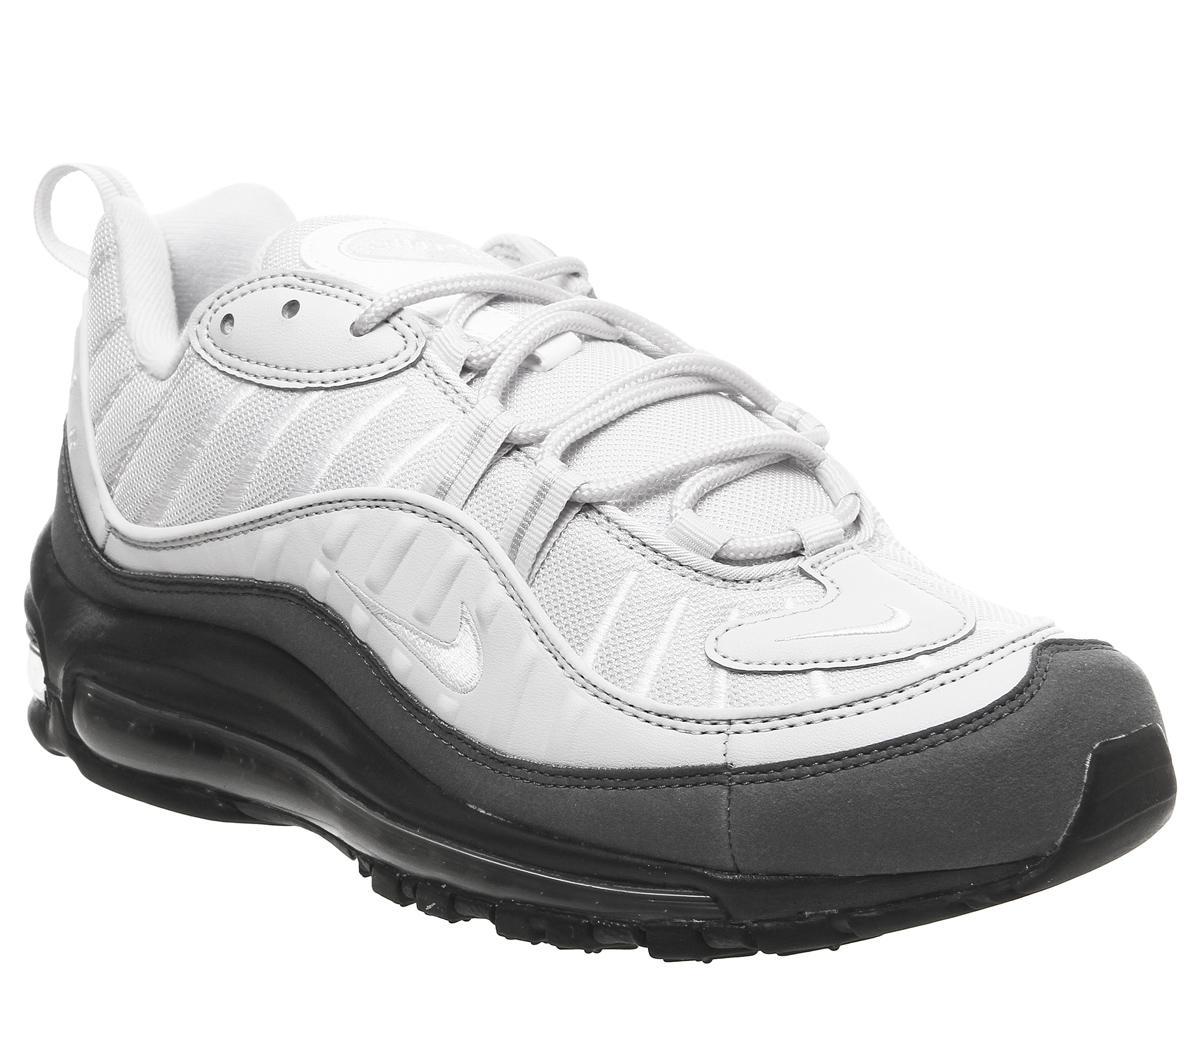 Nike Air Max 98 Trainers White Vast